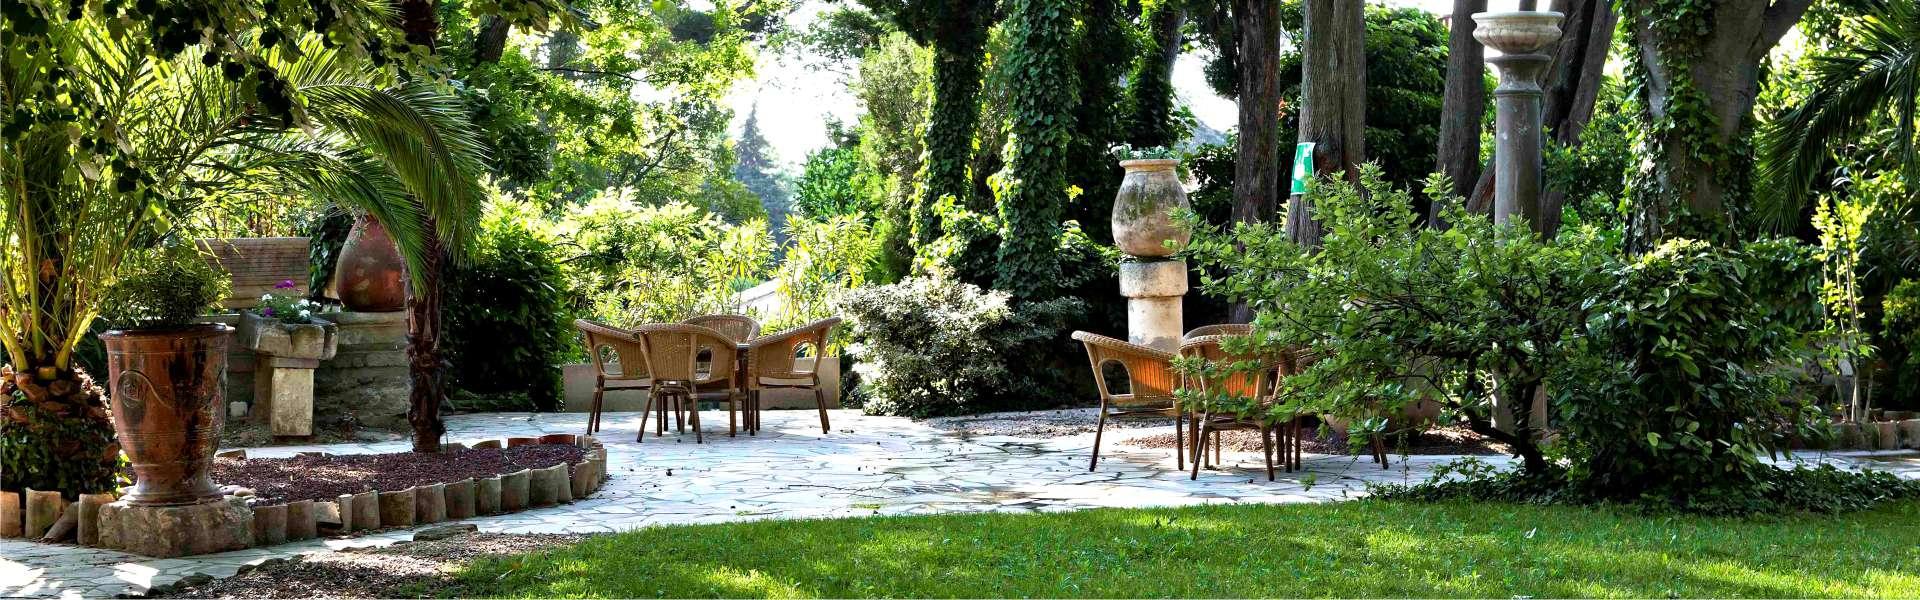 Le jardin méditerranéen du Najeti Hôtel la Magnaneraie